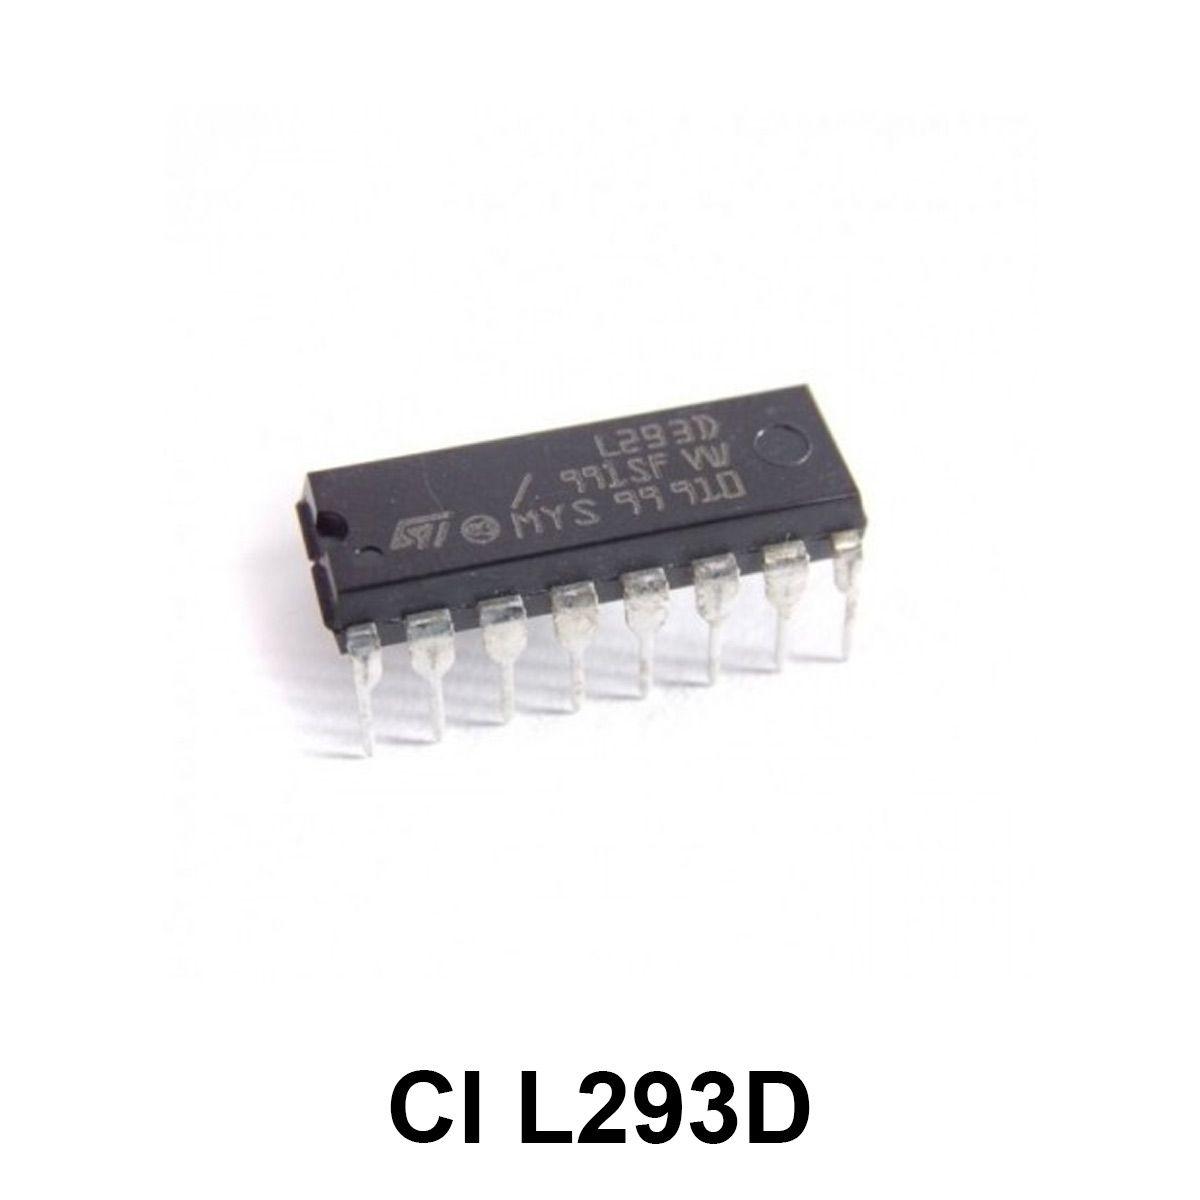 Circuito Integrado - CI L293D Ponte H Dupla